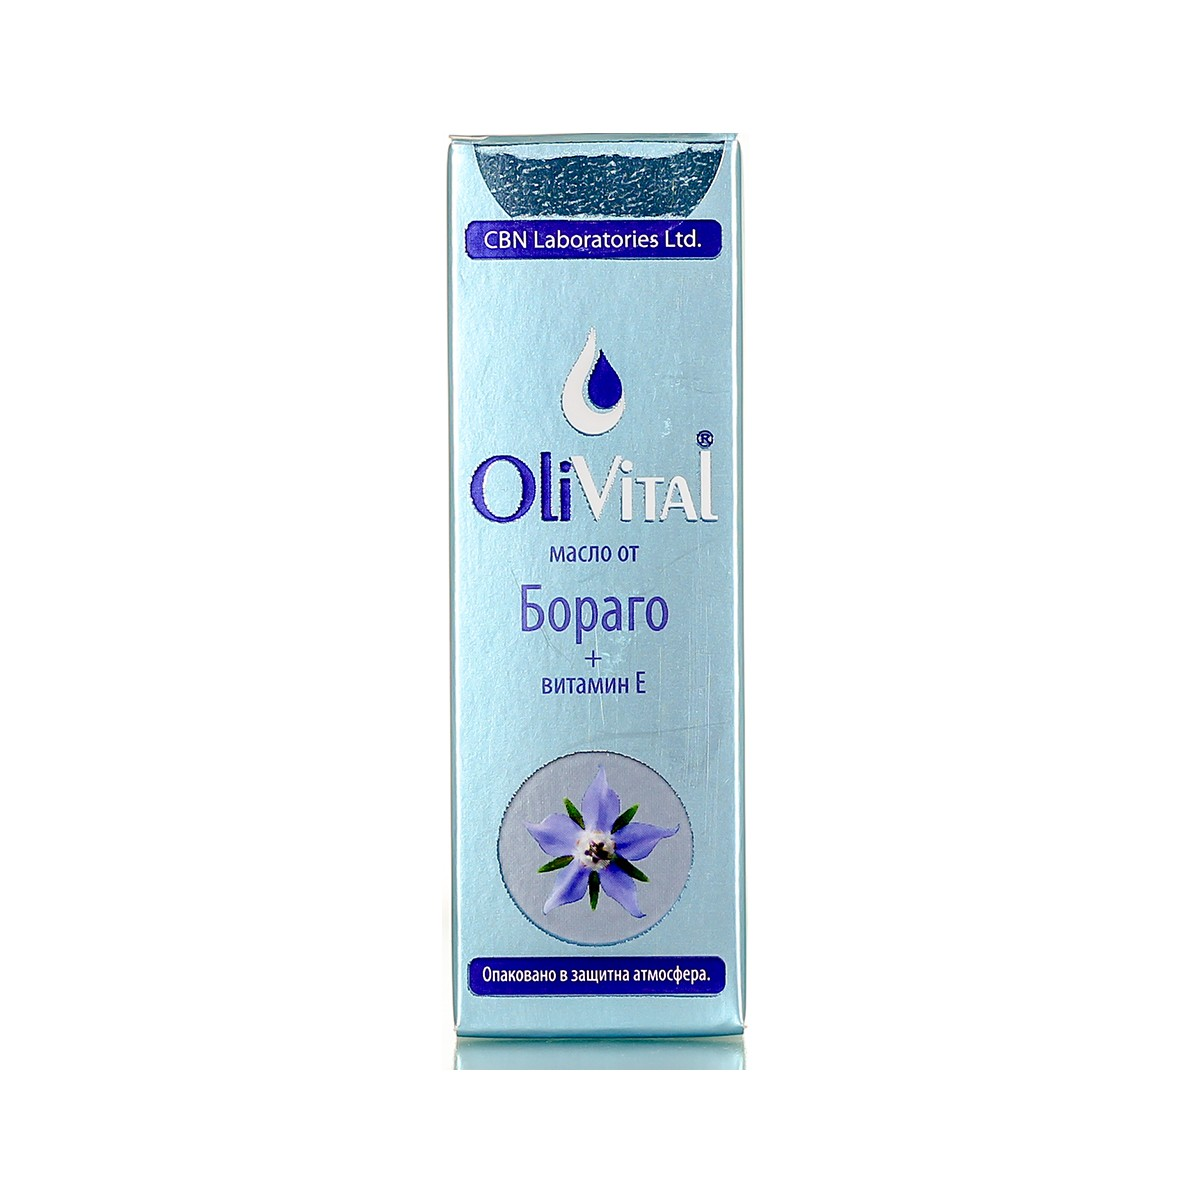 Natural borage seed oil OliVital CBN Laboratories